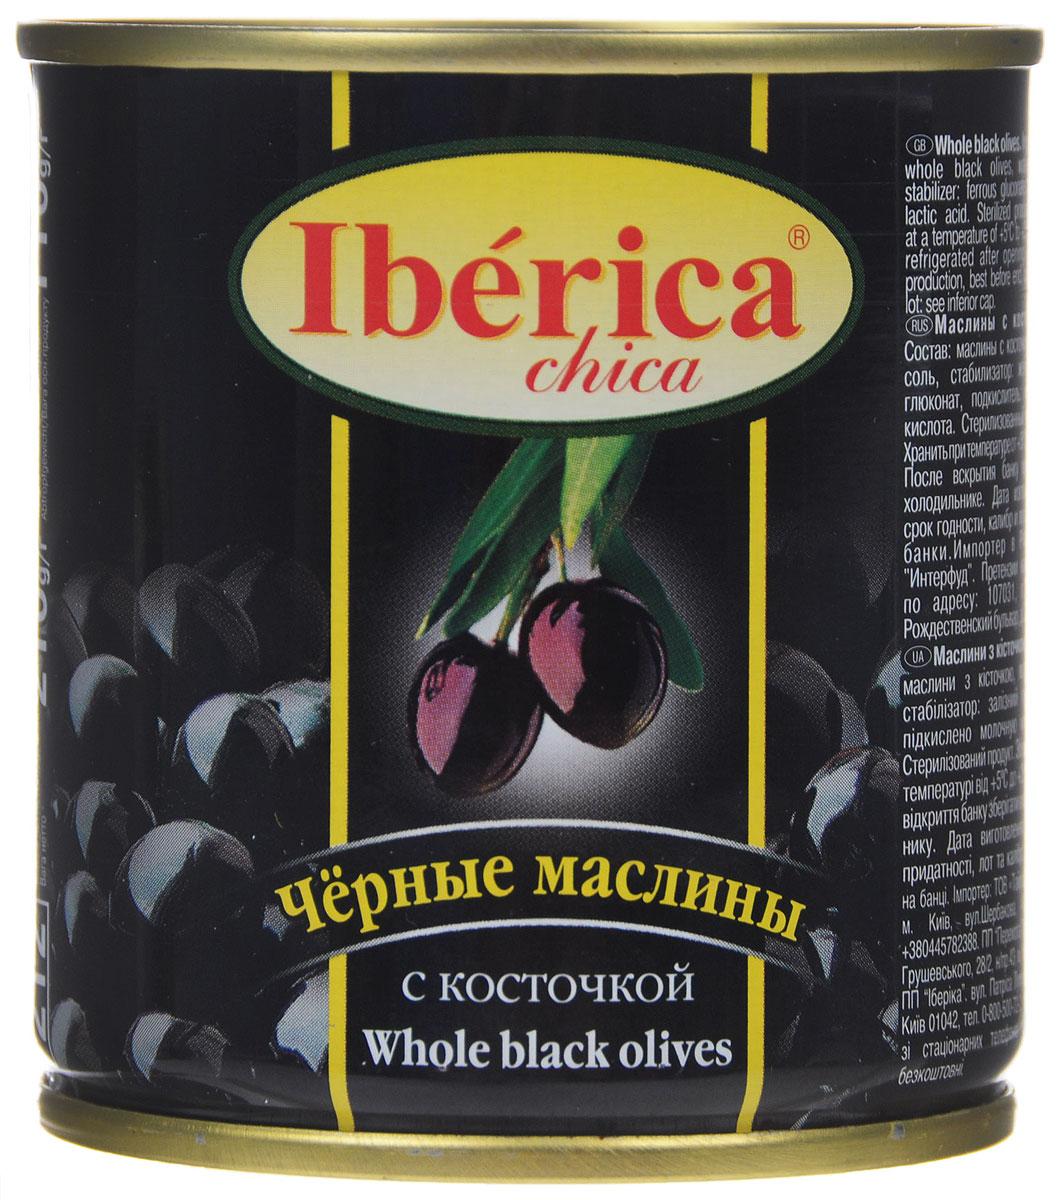 Iberica Сhica маслины с косточкой, 210 г ideal маслины с косточкой extra class 300 г